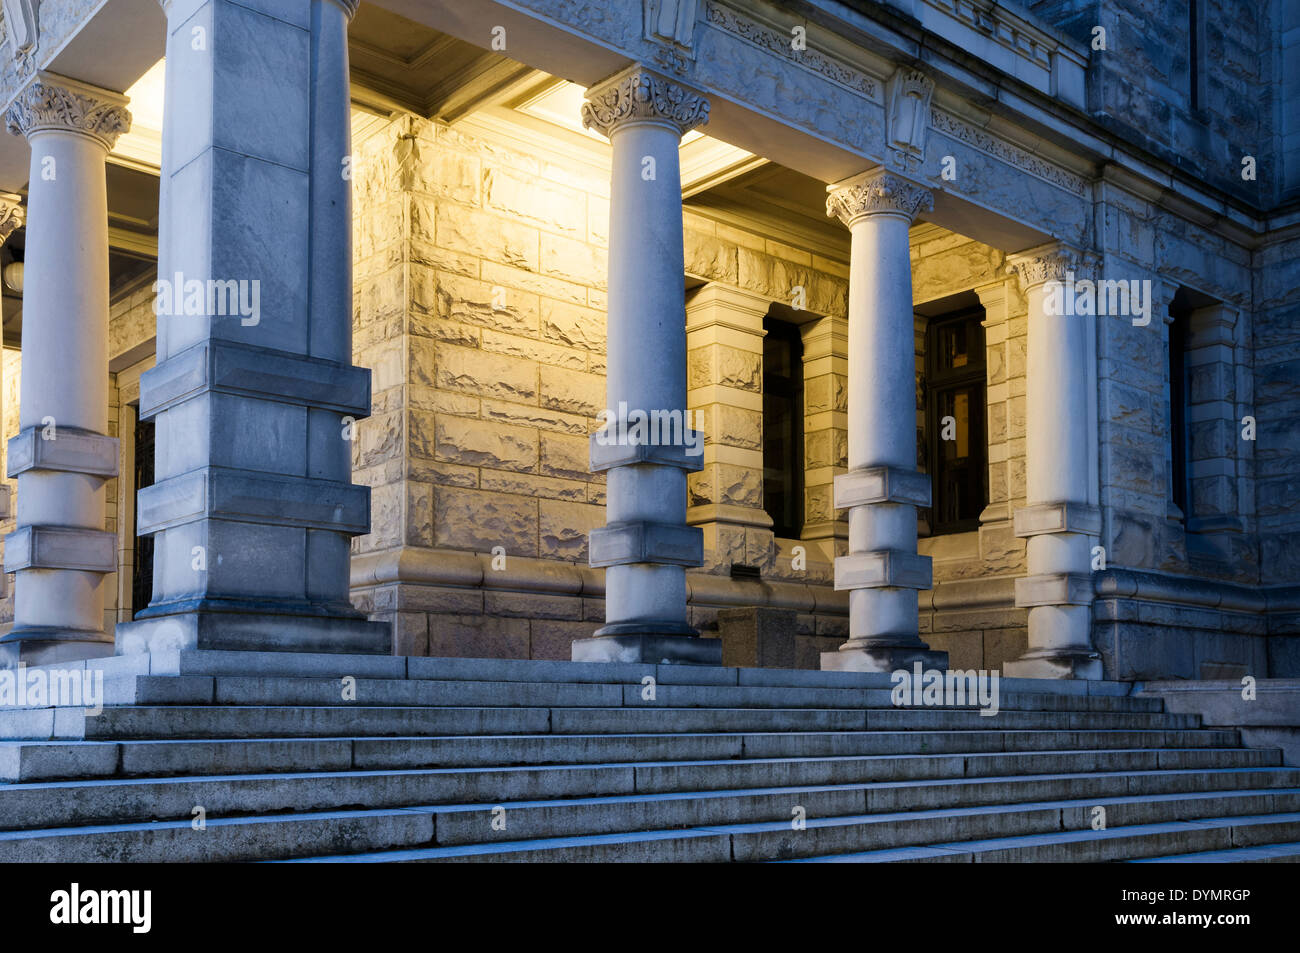 Rear steps and columns, British Columbia Legislature, Victoria, British Columbia, Canada - Stock Image